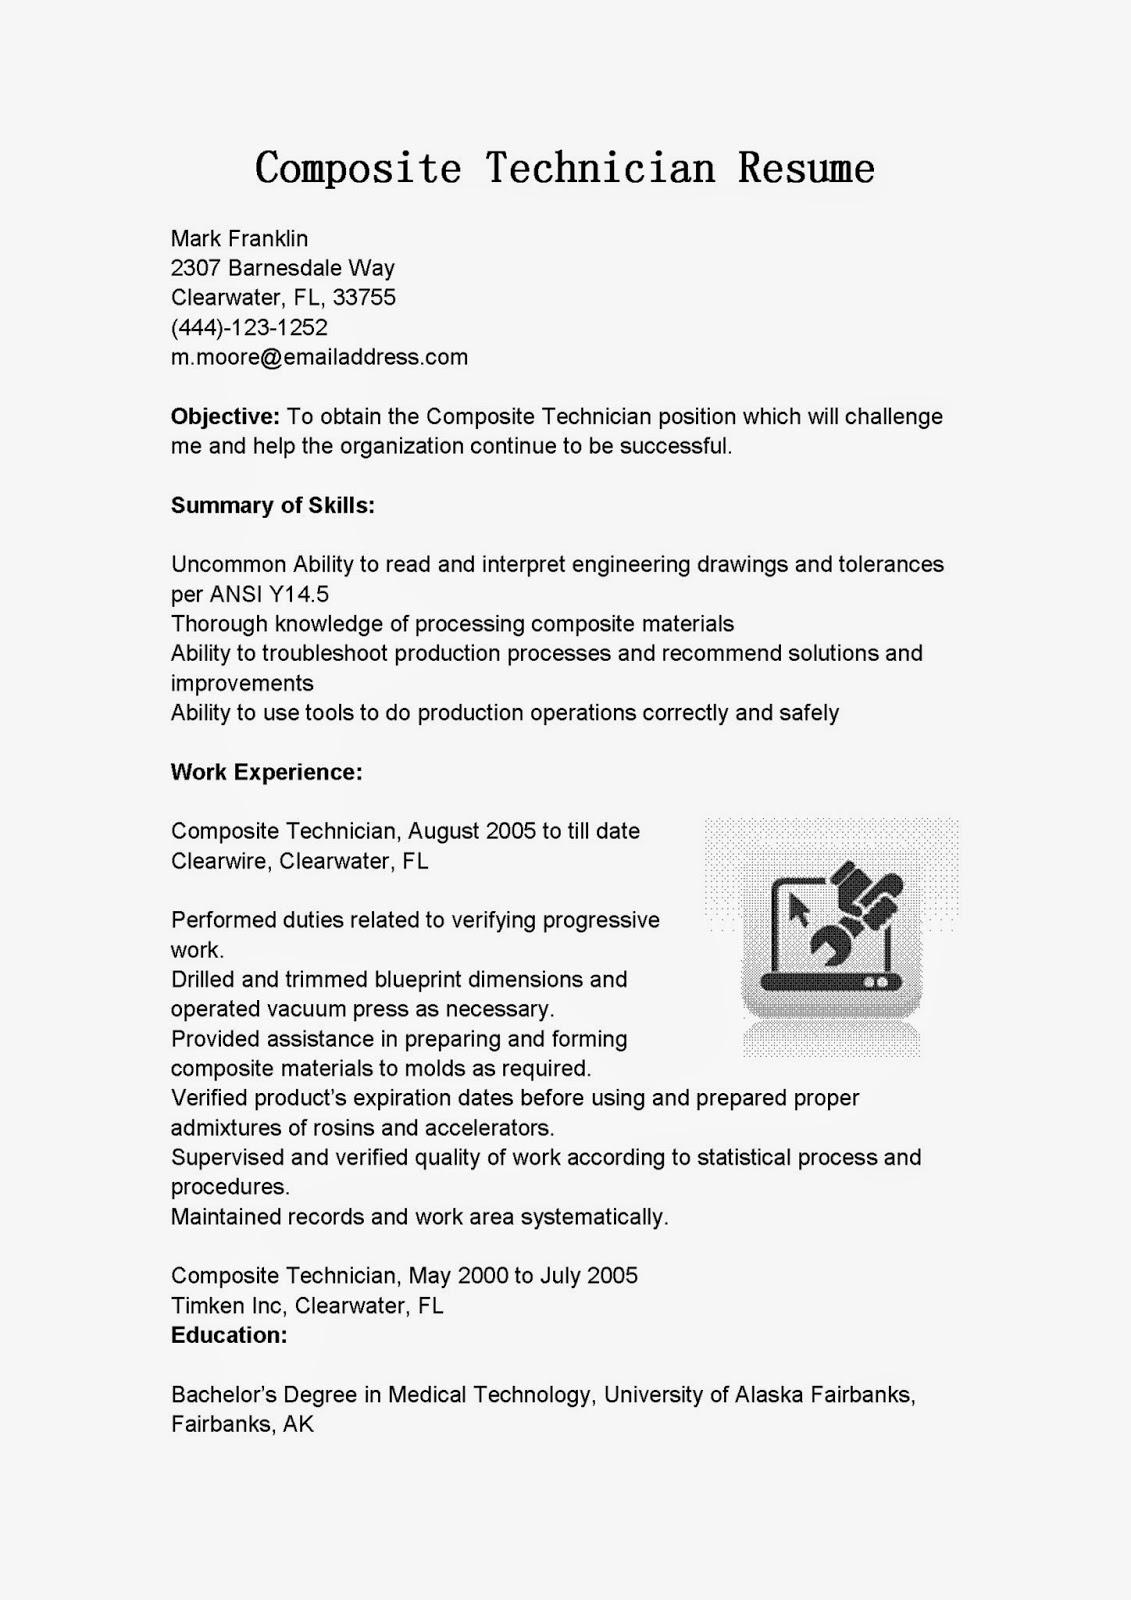 resume samples  composite technician resume sample